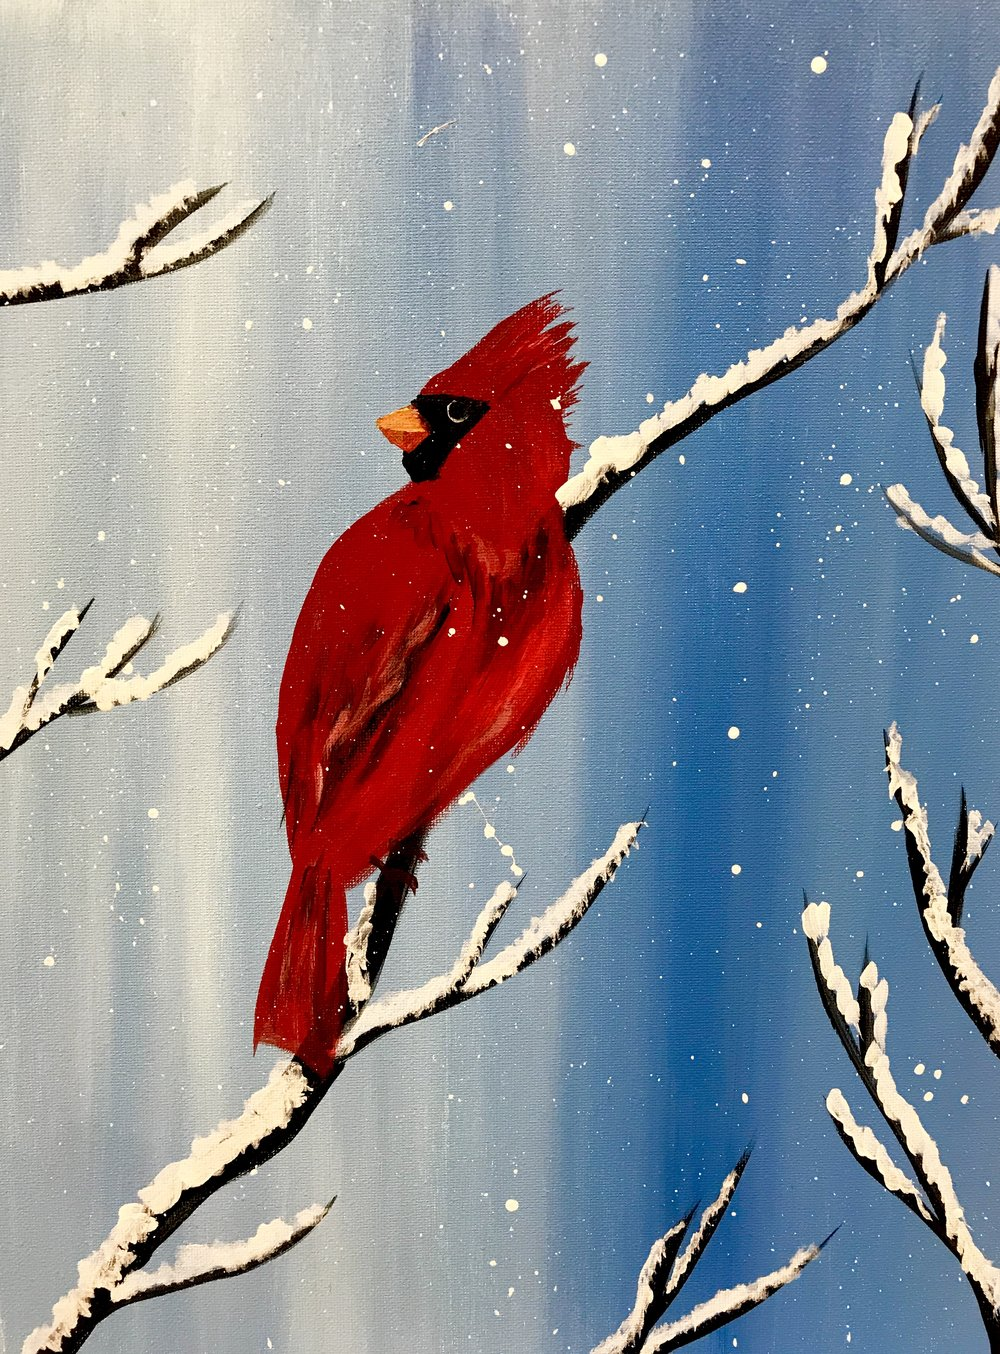 Scarlet in Snow.jpg